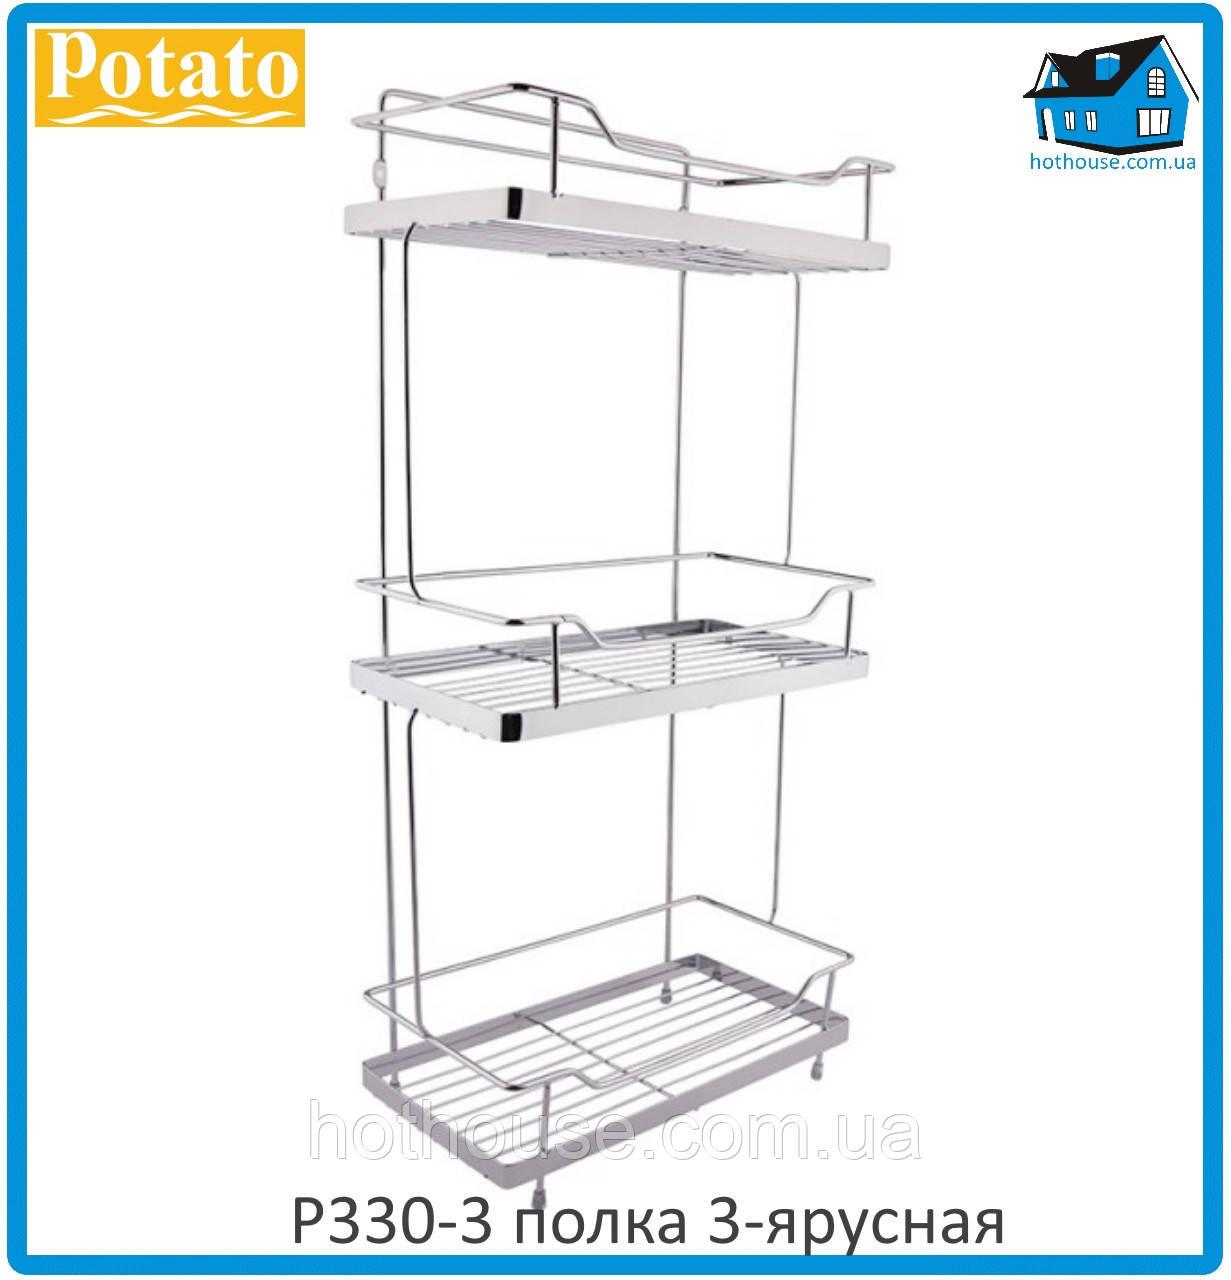 Полка Potato P330-3 полка 3-ярусная